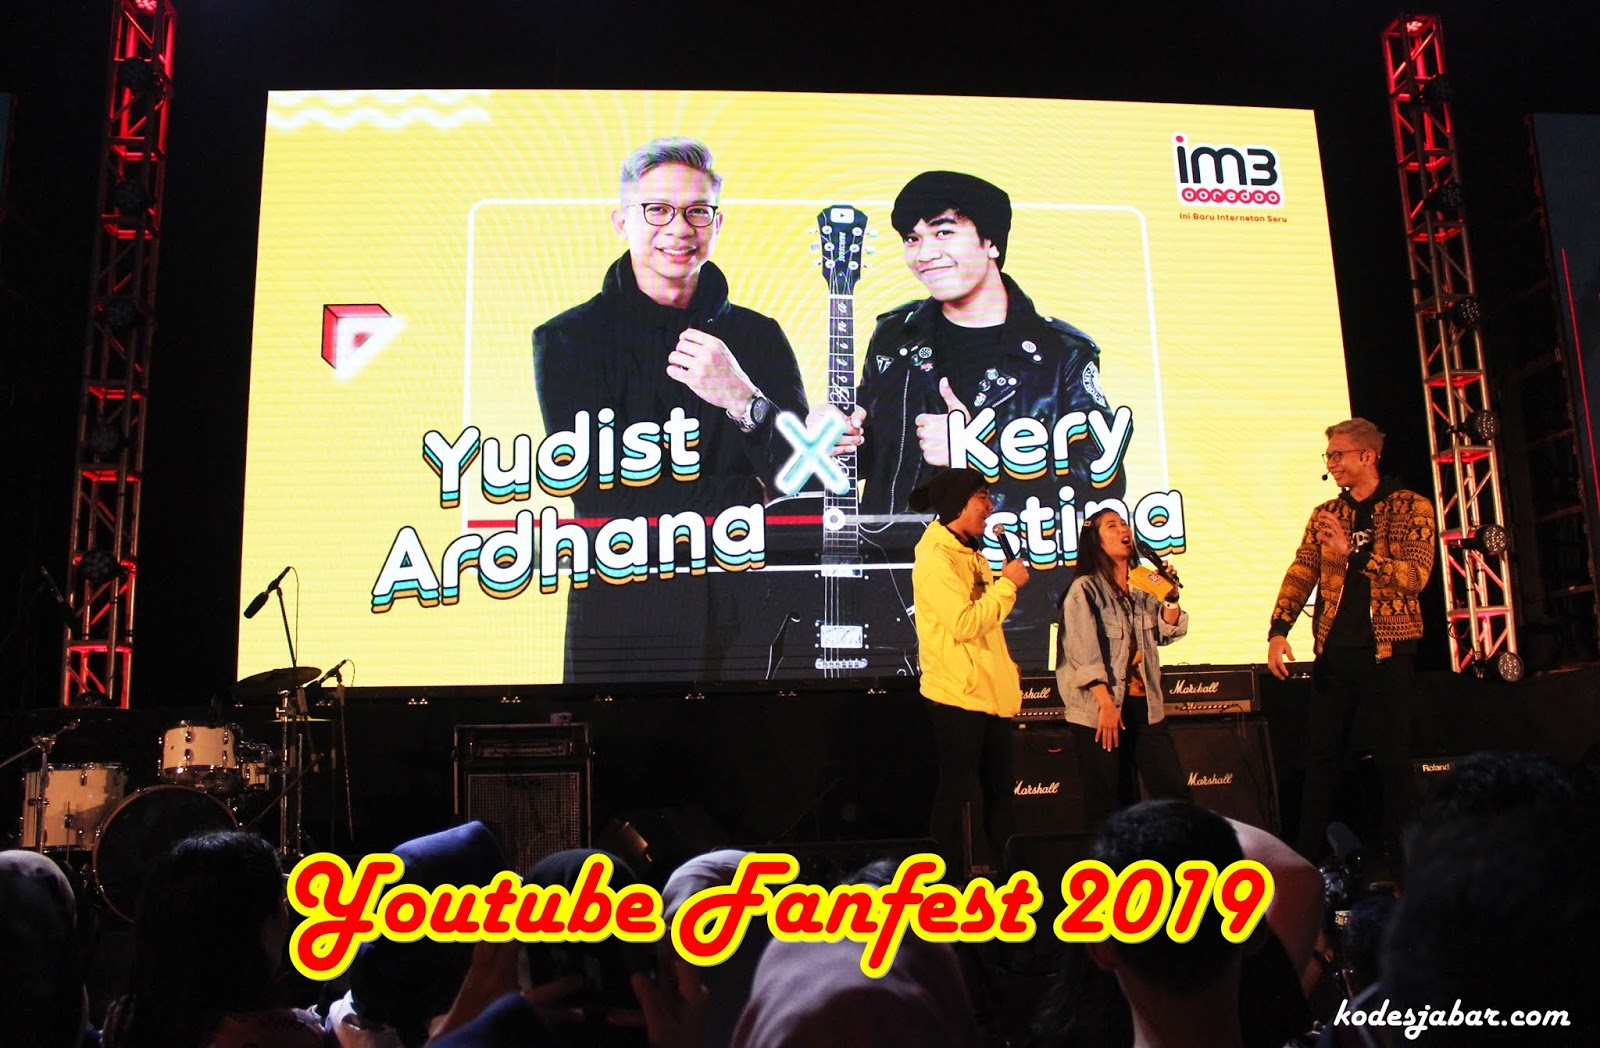 Keseruan Showcase YouTube FanFest 2019 Bersama IM3 Ooredoo di Bandung